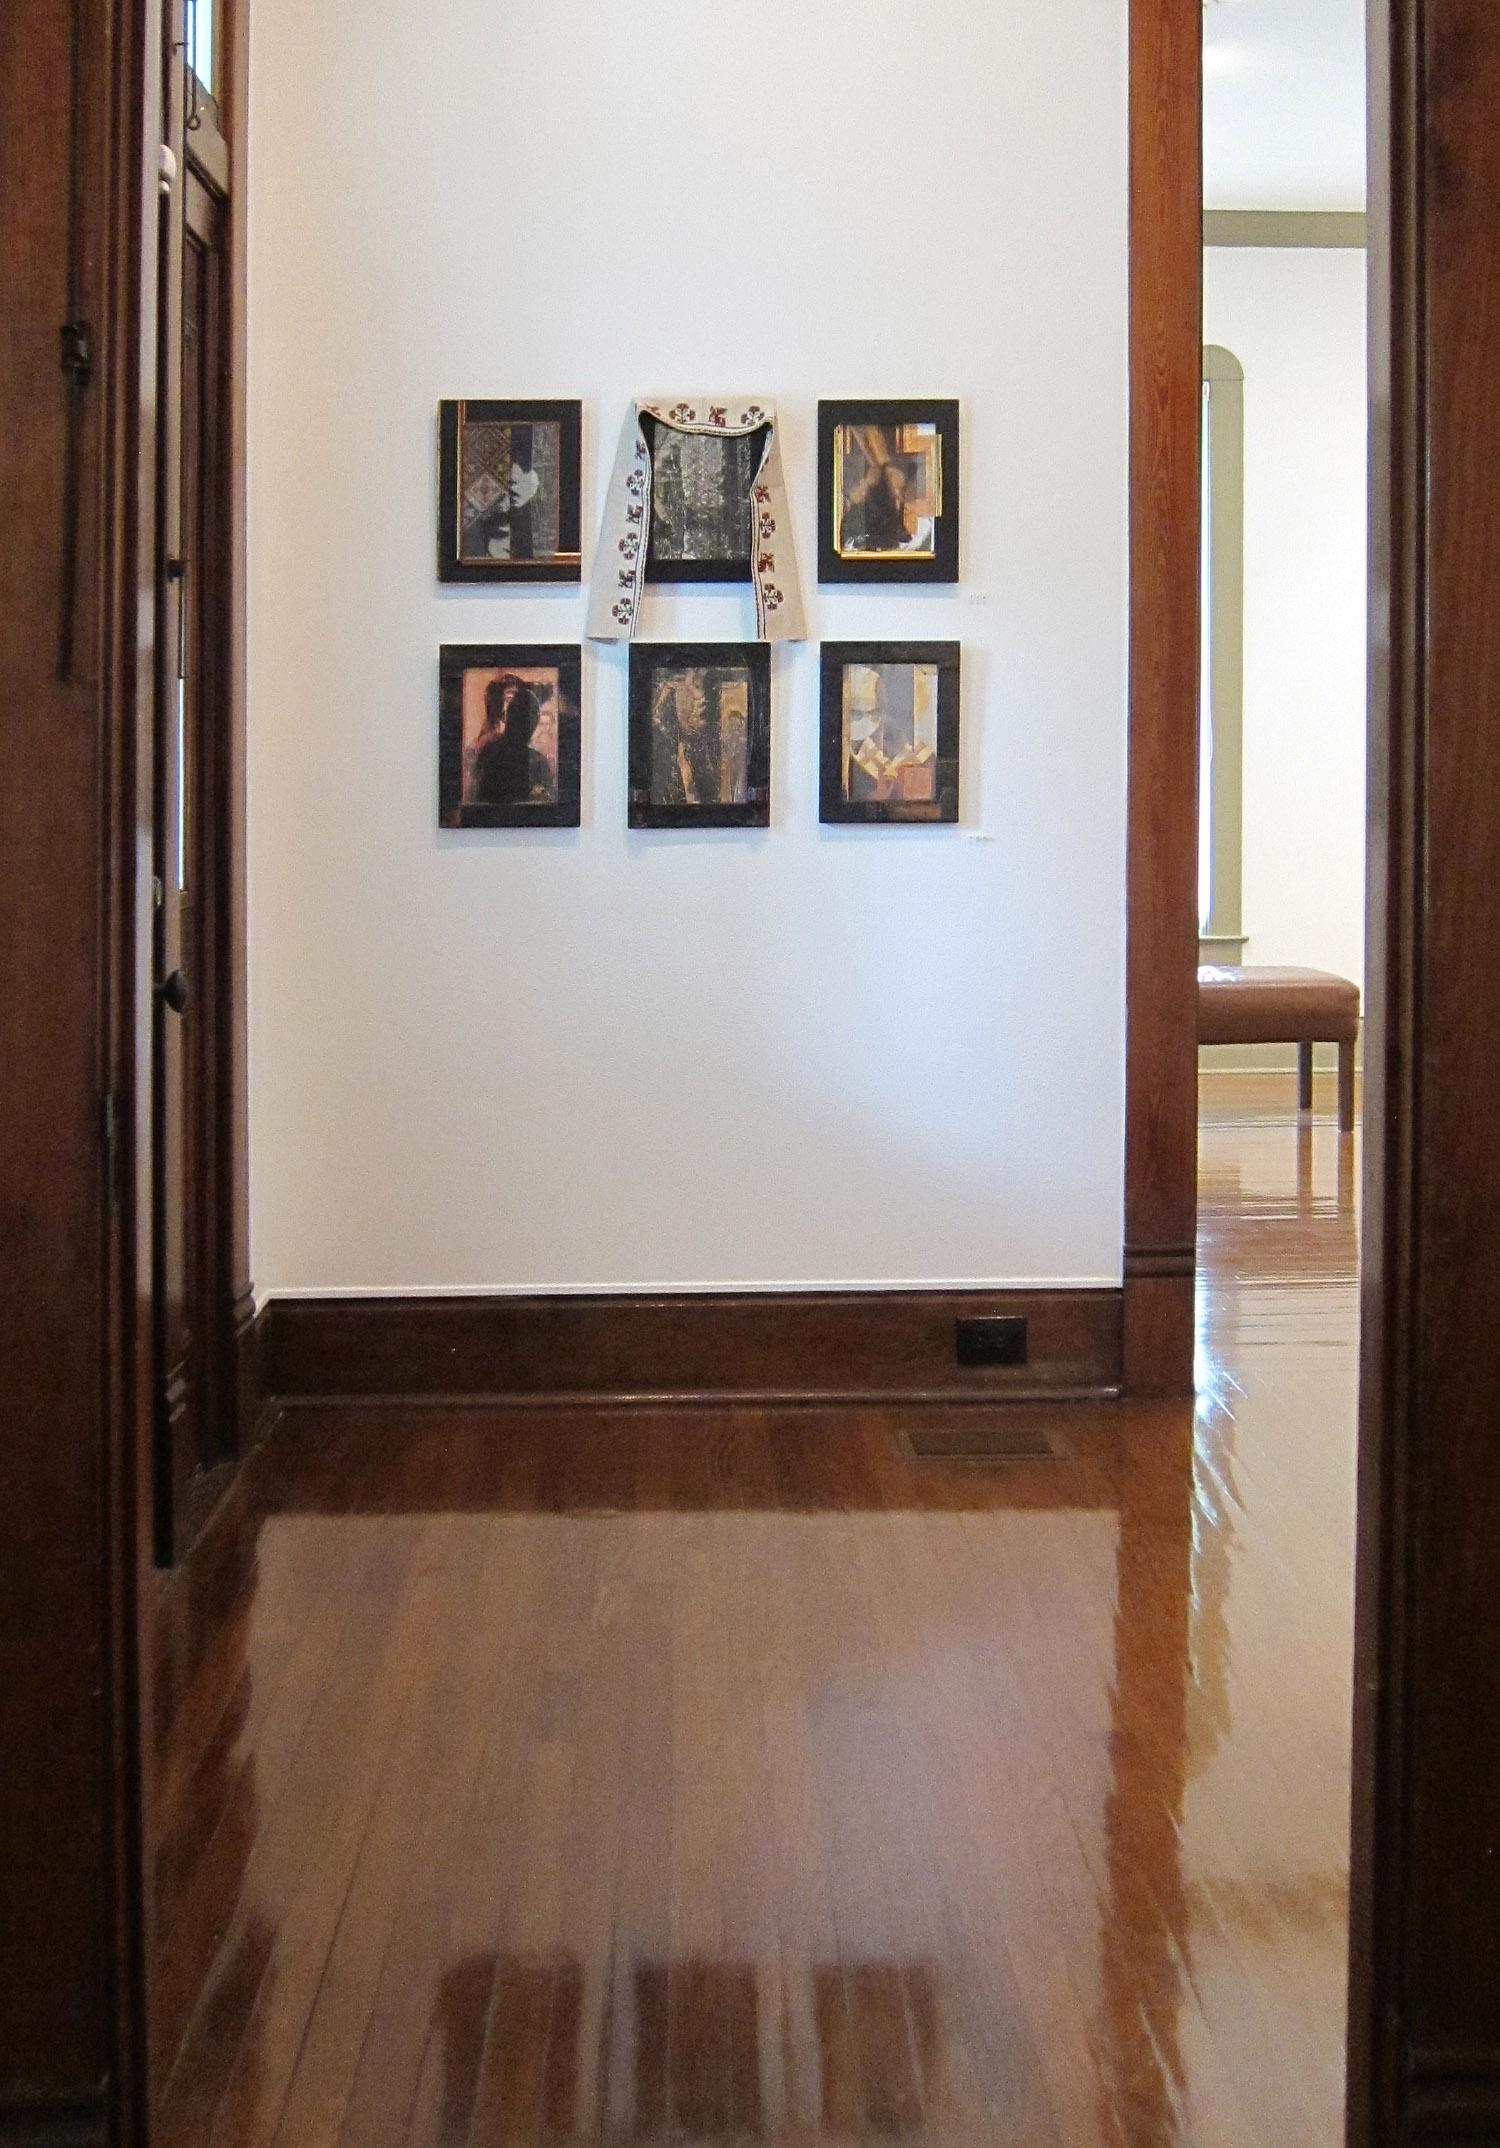 5ab(1)Grouping at at Beeville Art Museum 2014.jpg